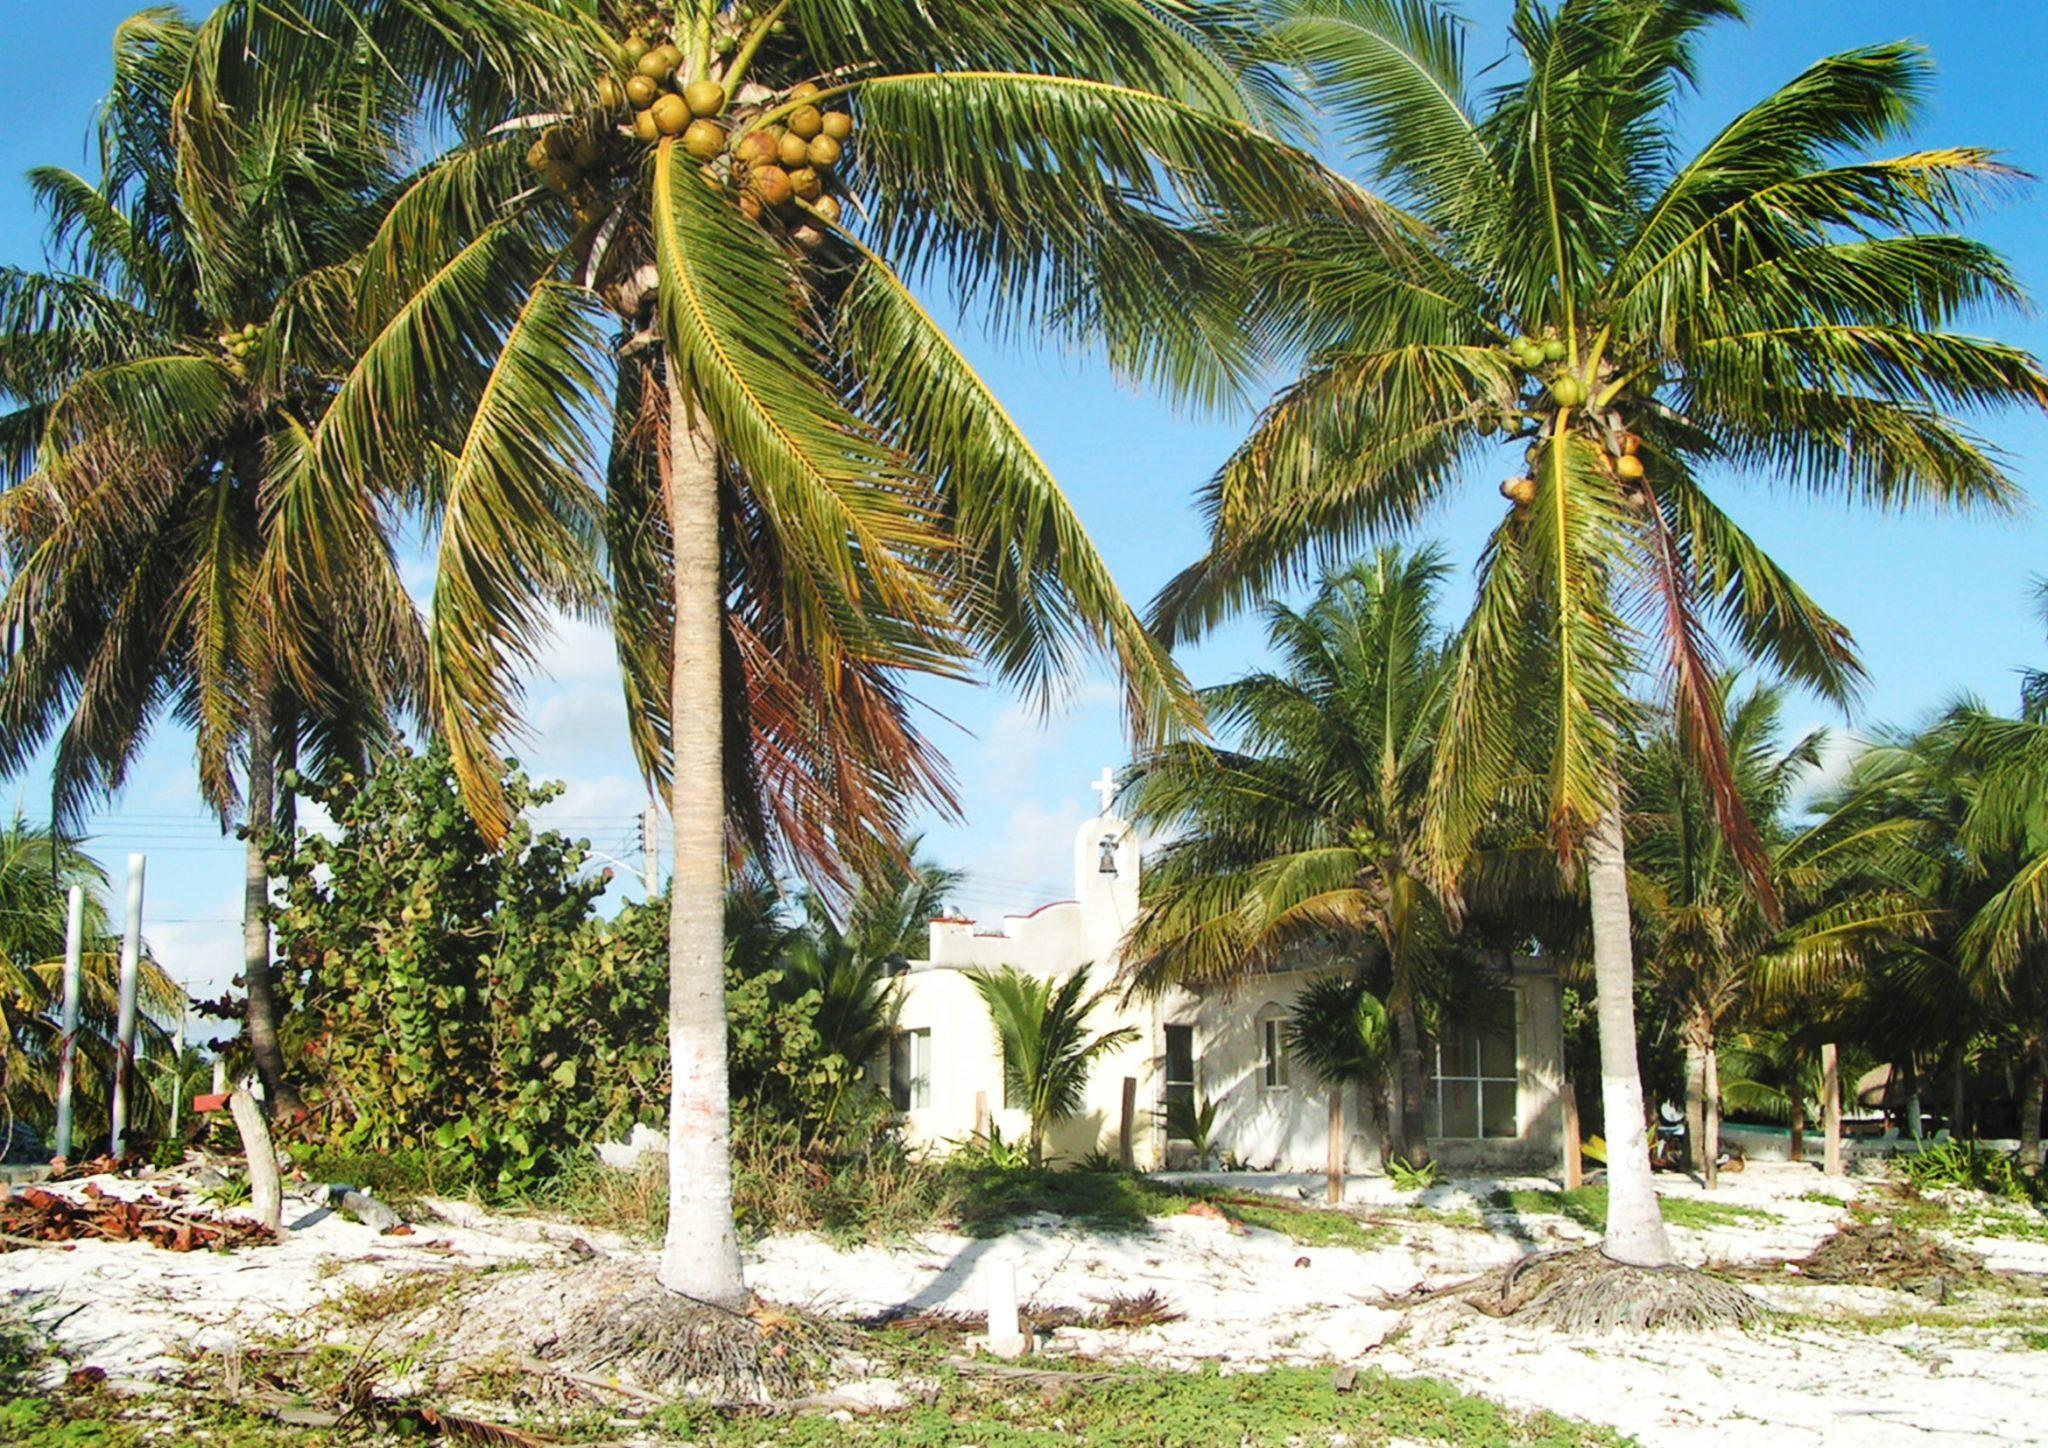 Punta Allen7 1 - Meksyk - Jukatan - plaże i cenoty